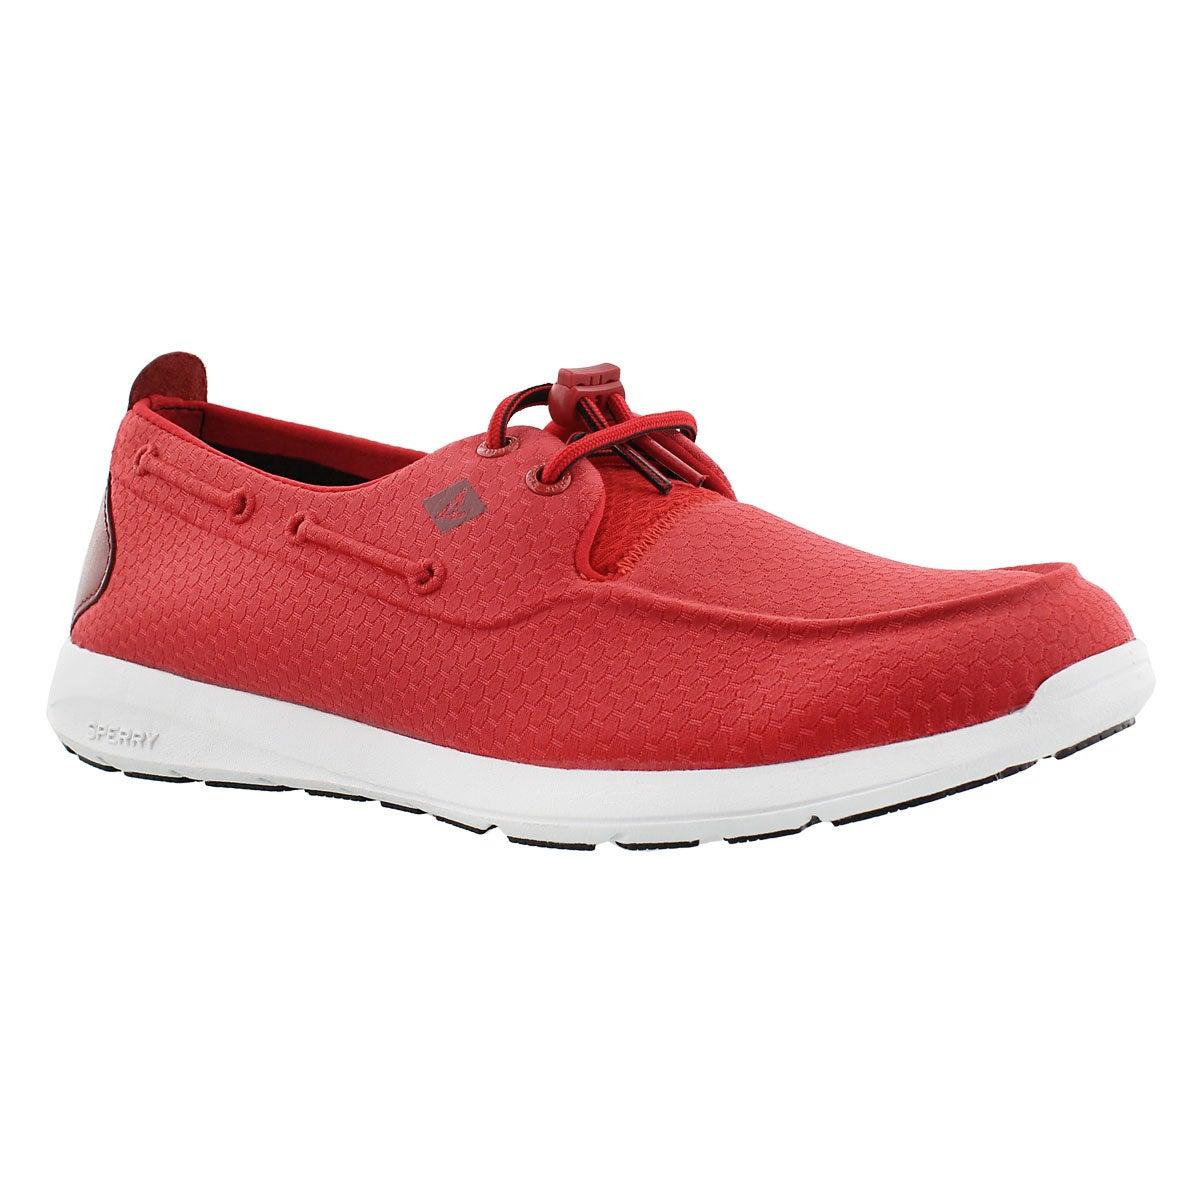 Men's SOJOURN red molded mesh sneakers